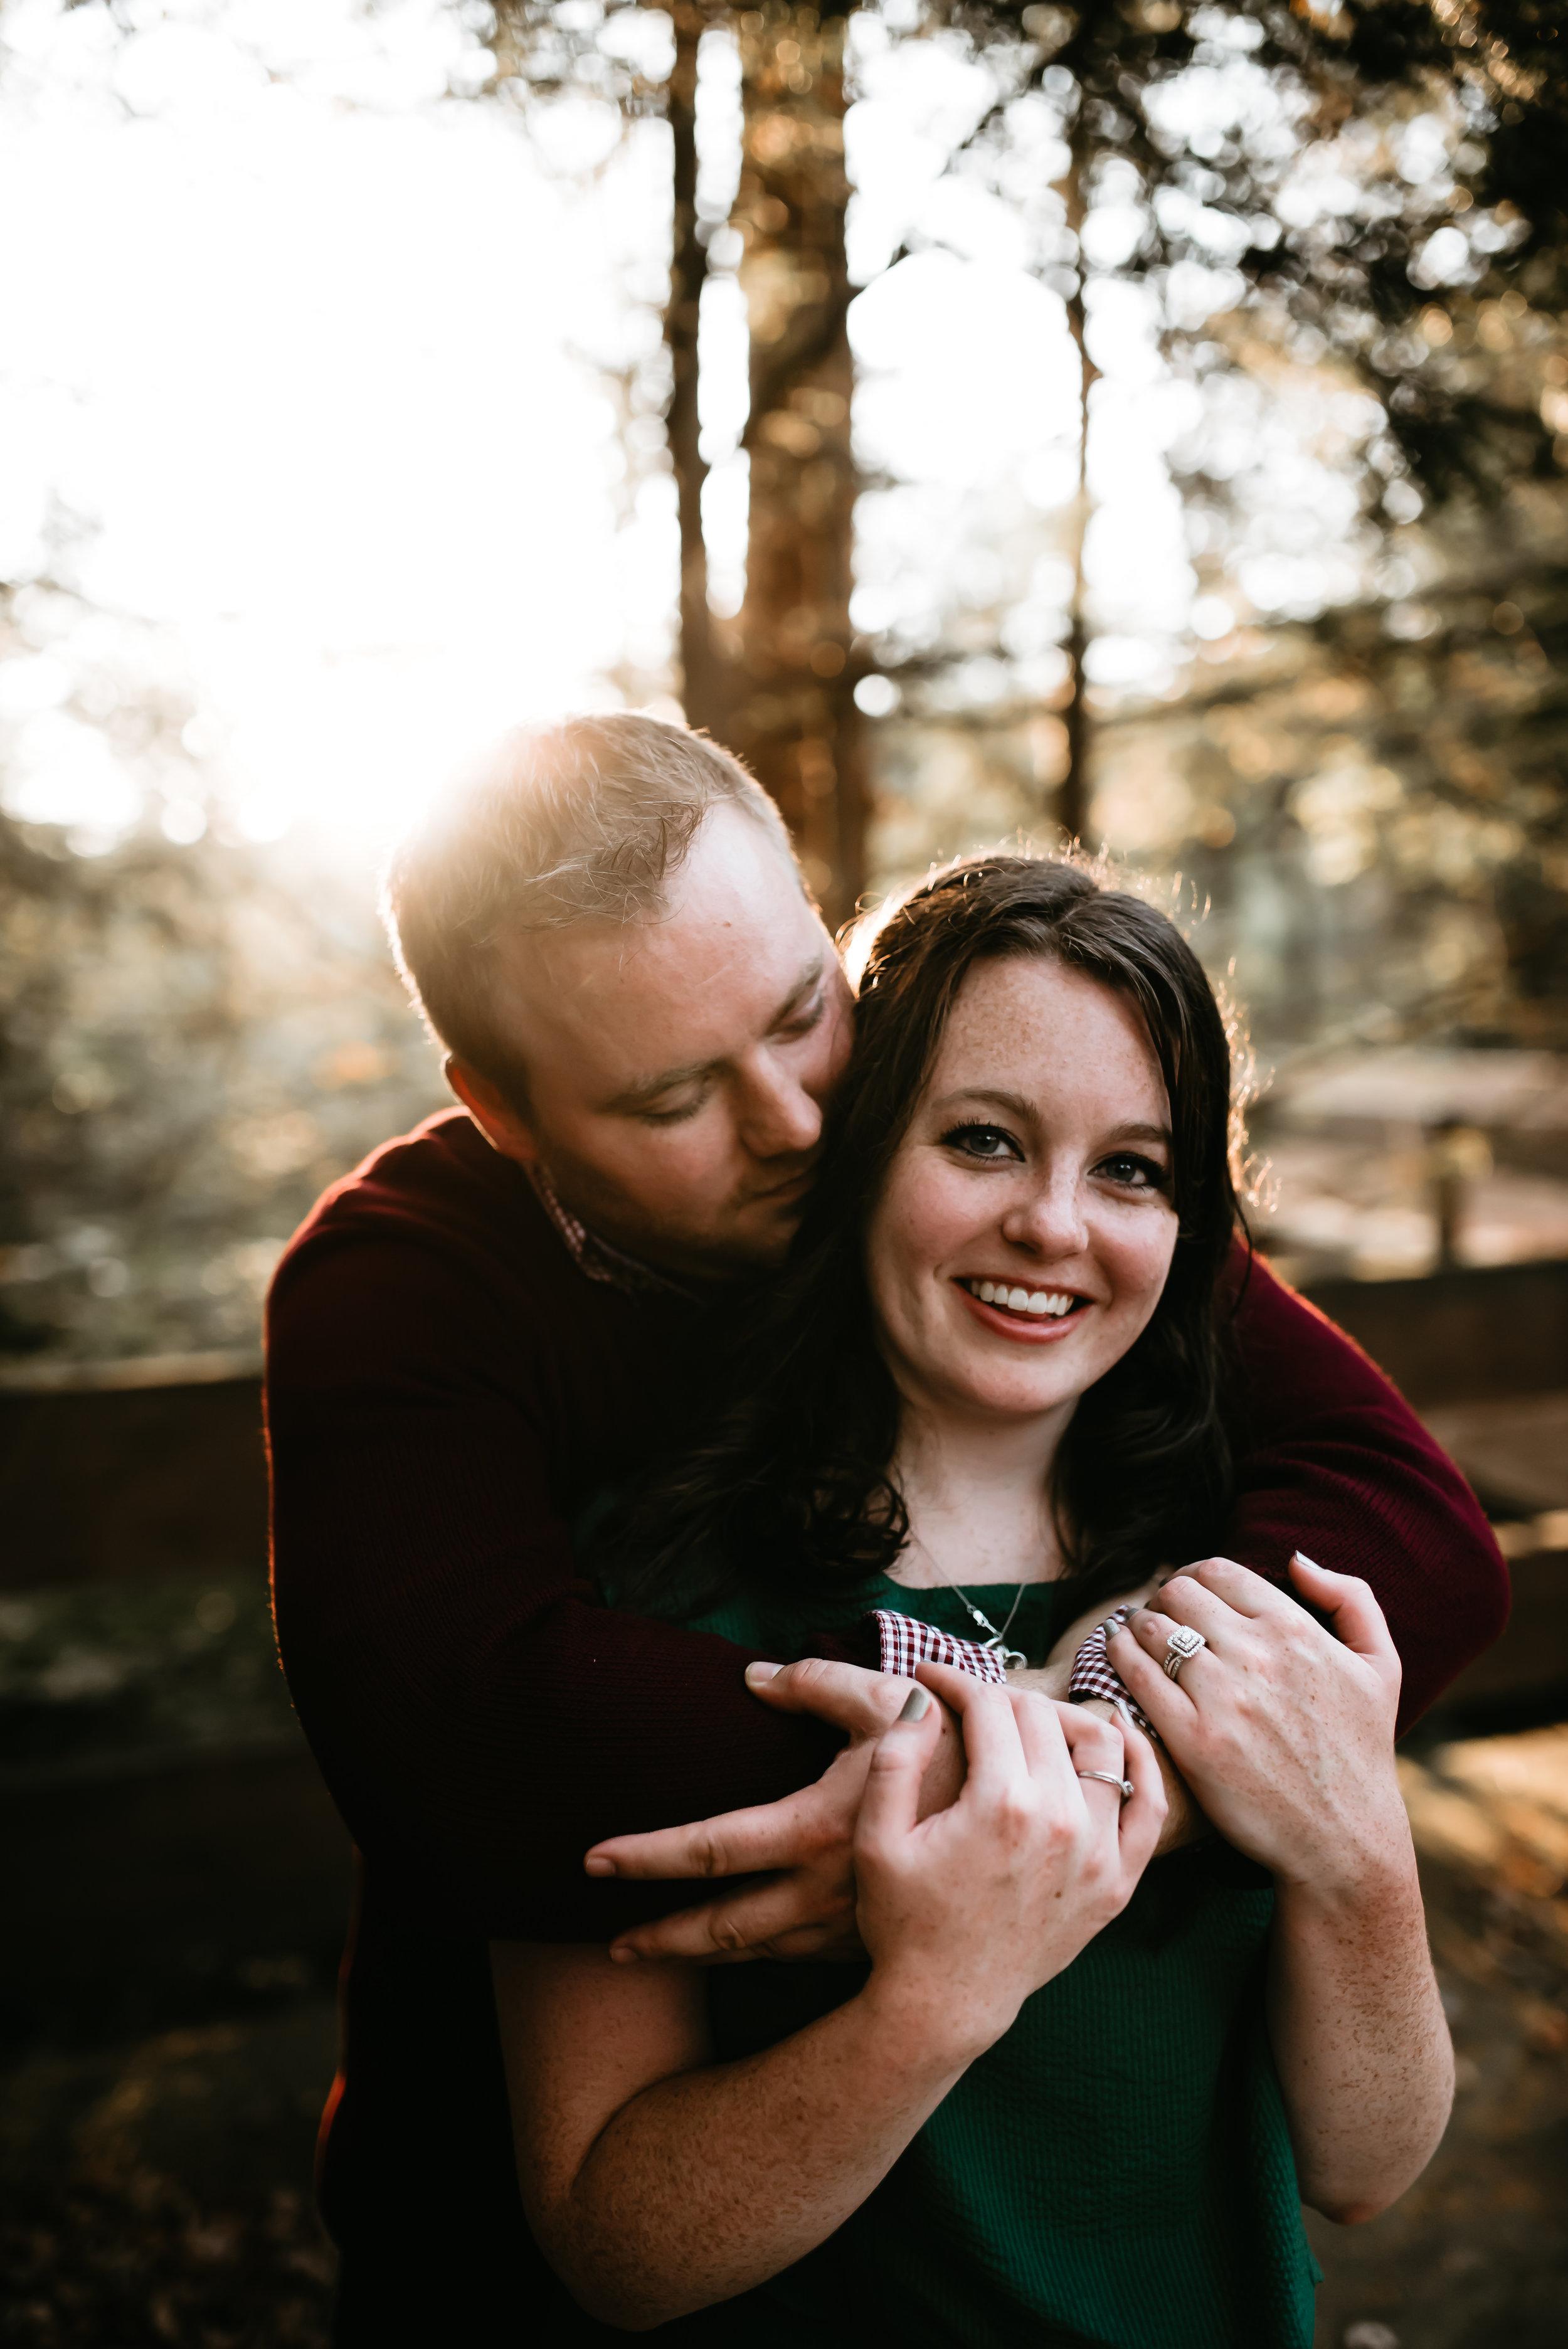 NEPA-wedding-engagement-photographer-in-dallas-pa-8.jpg